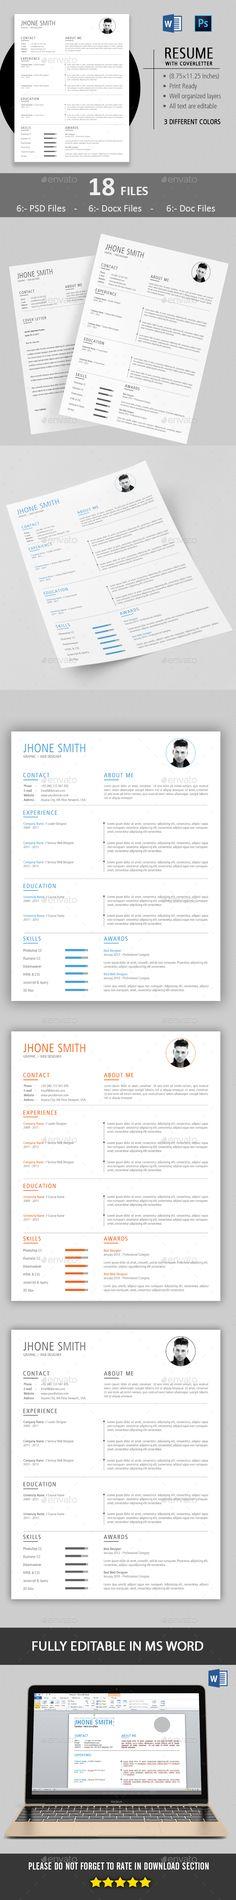 Resume Pinterest Template, Cv ideas and Simple resume - cv vs resume